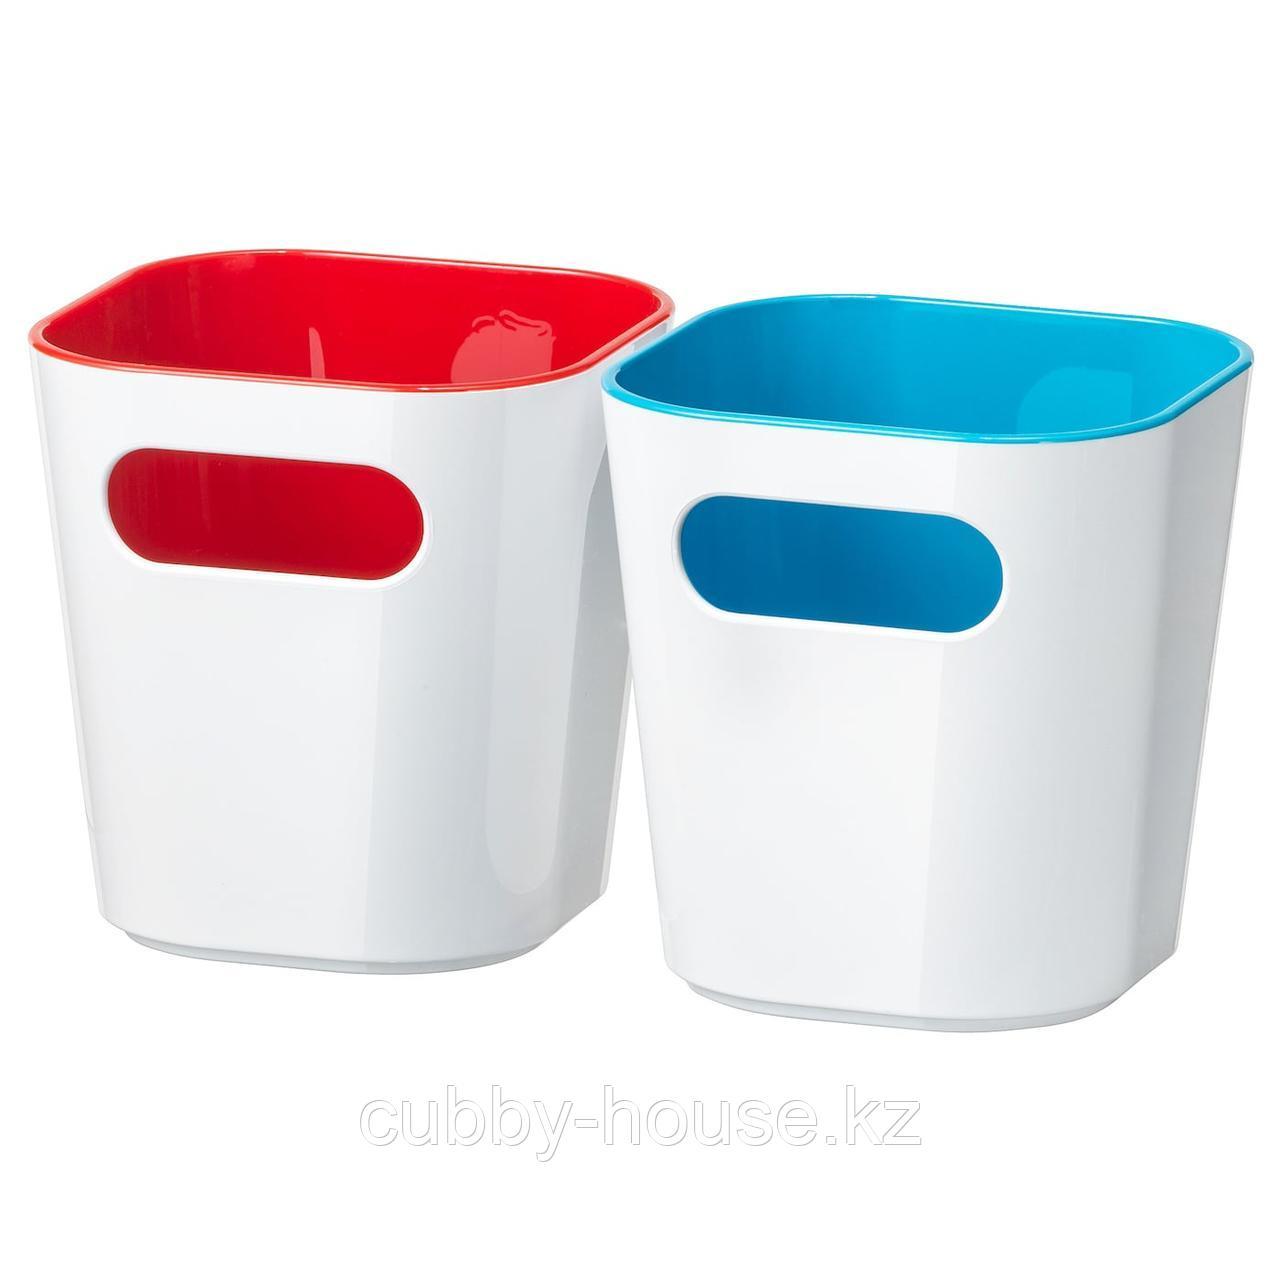 ГЕССАН Контейнер, белый, 10x10x10 см